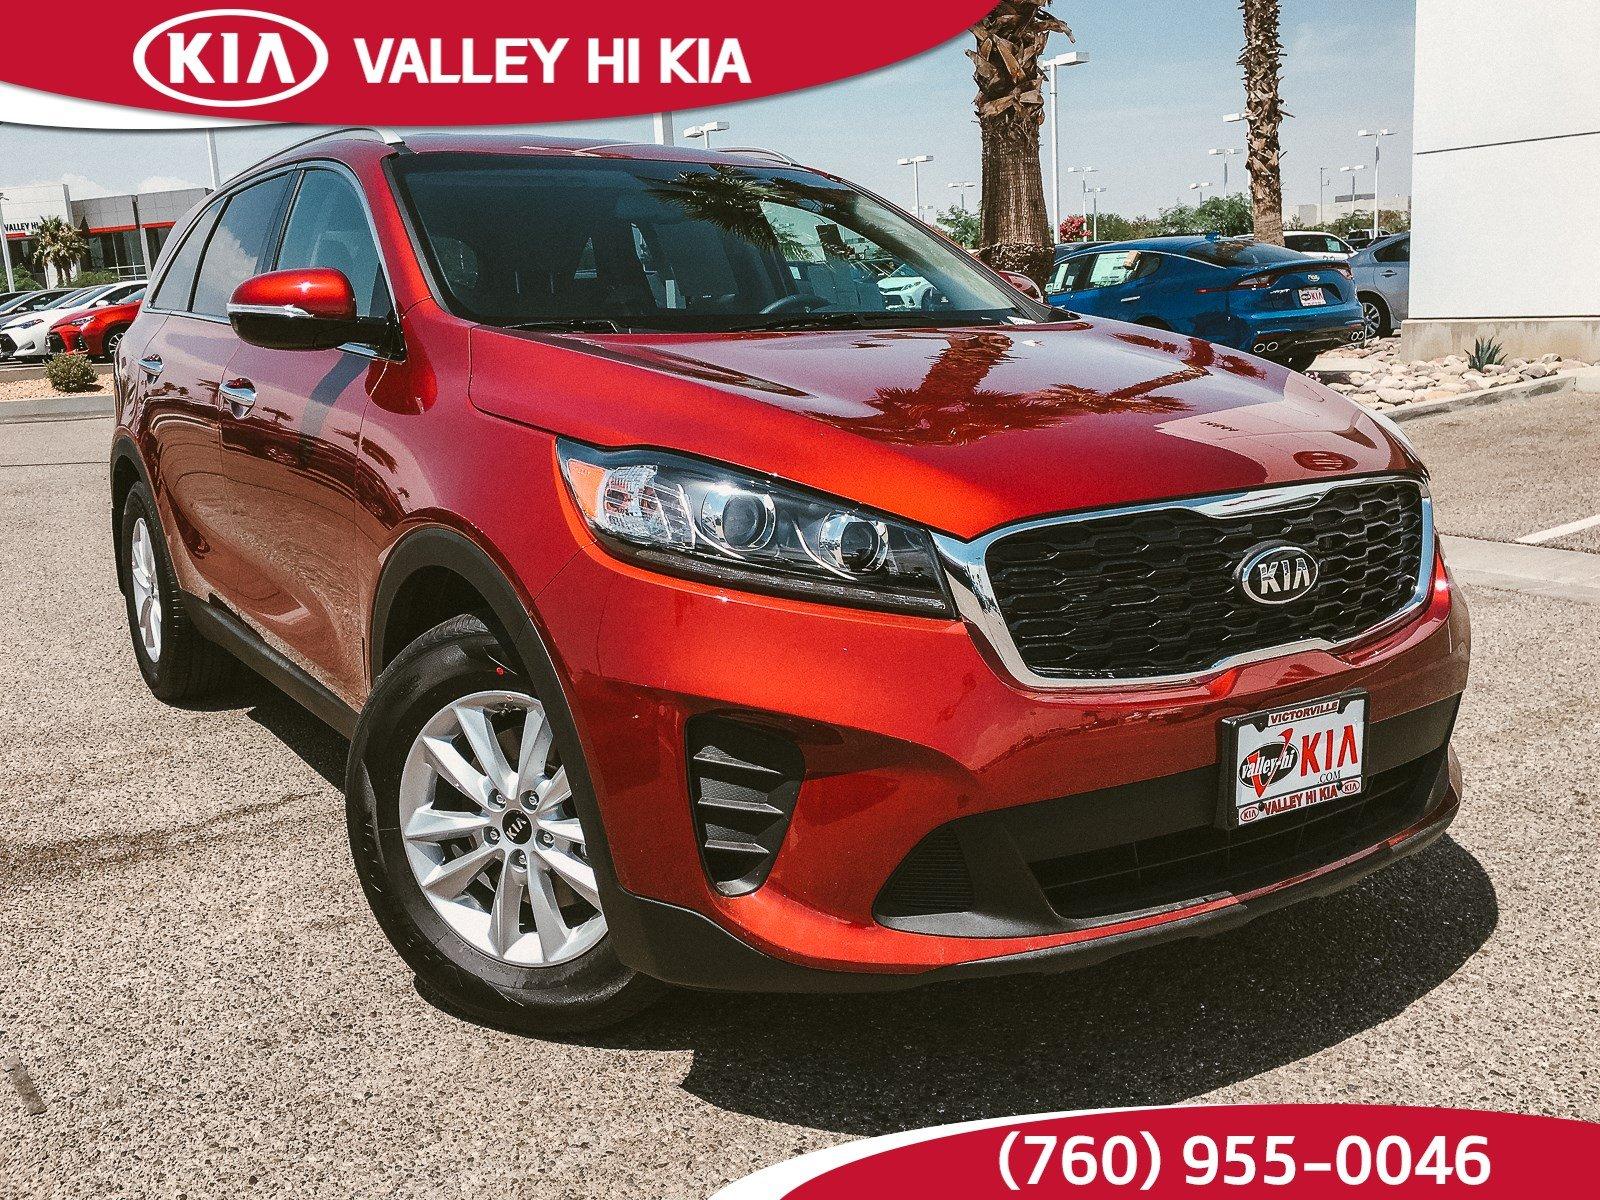 Valley Hi Kia >> Featured Kia Inventory In Victorville Ca Valey Hi Kia